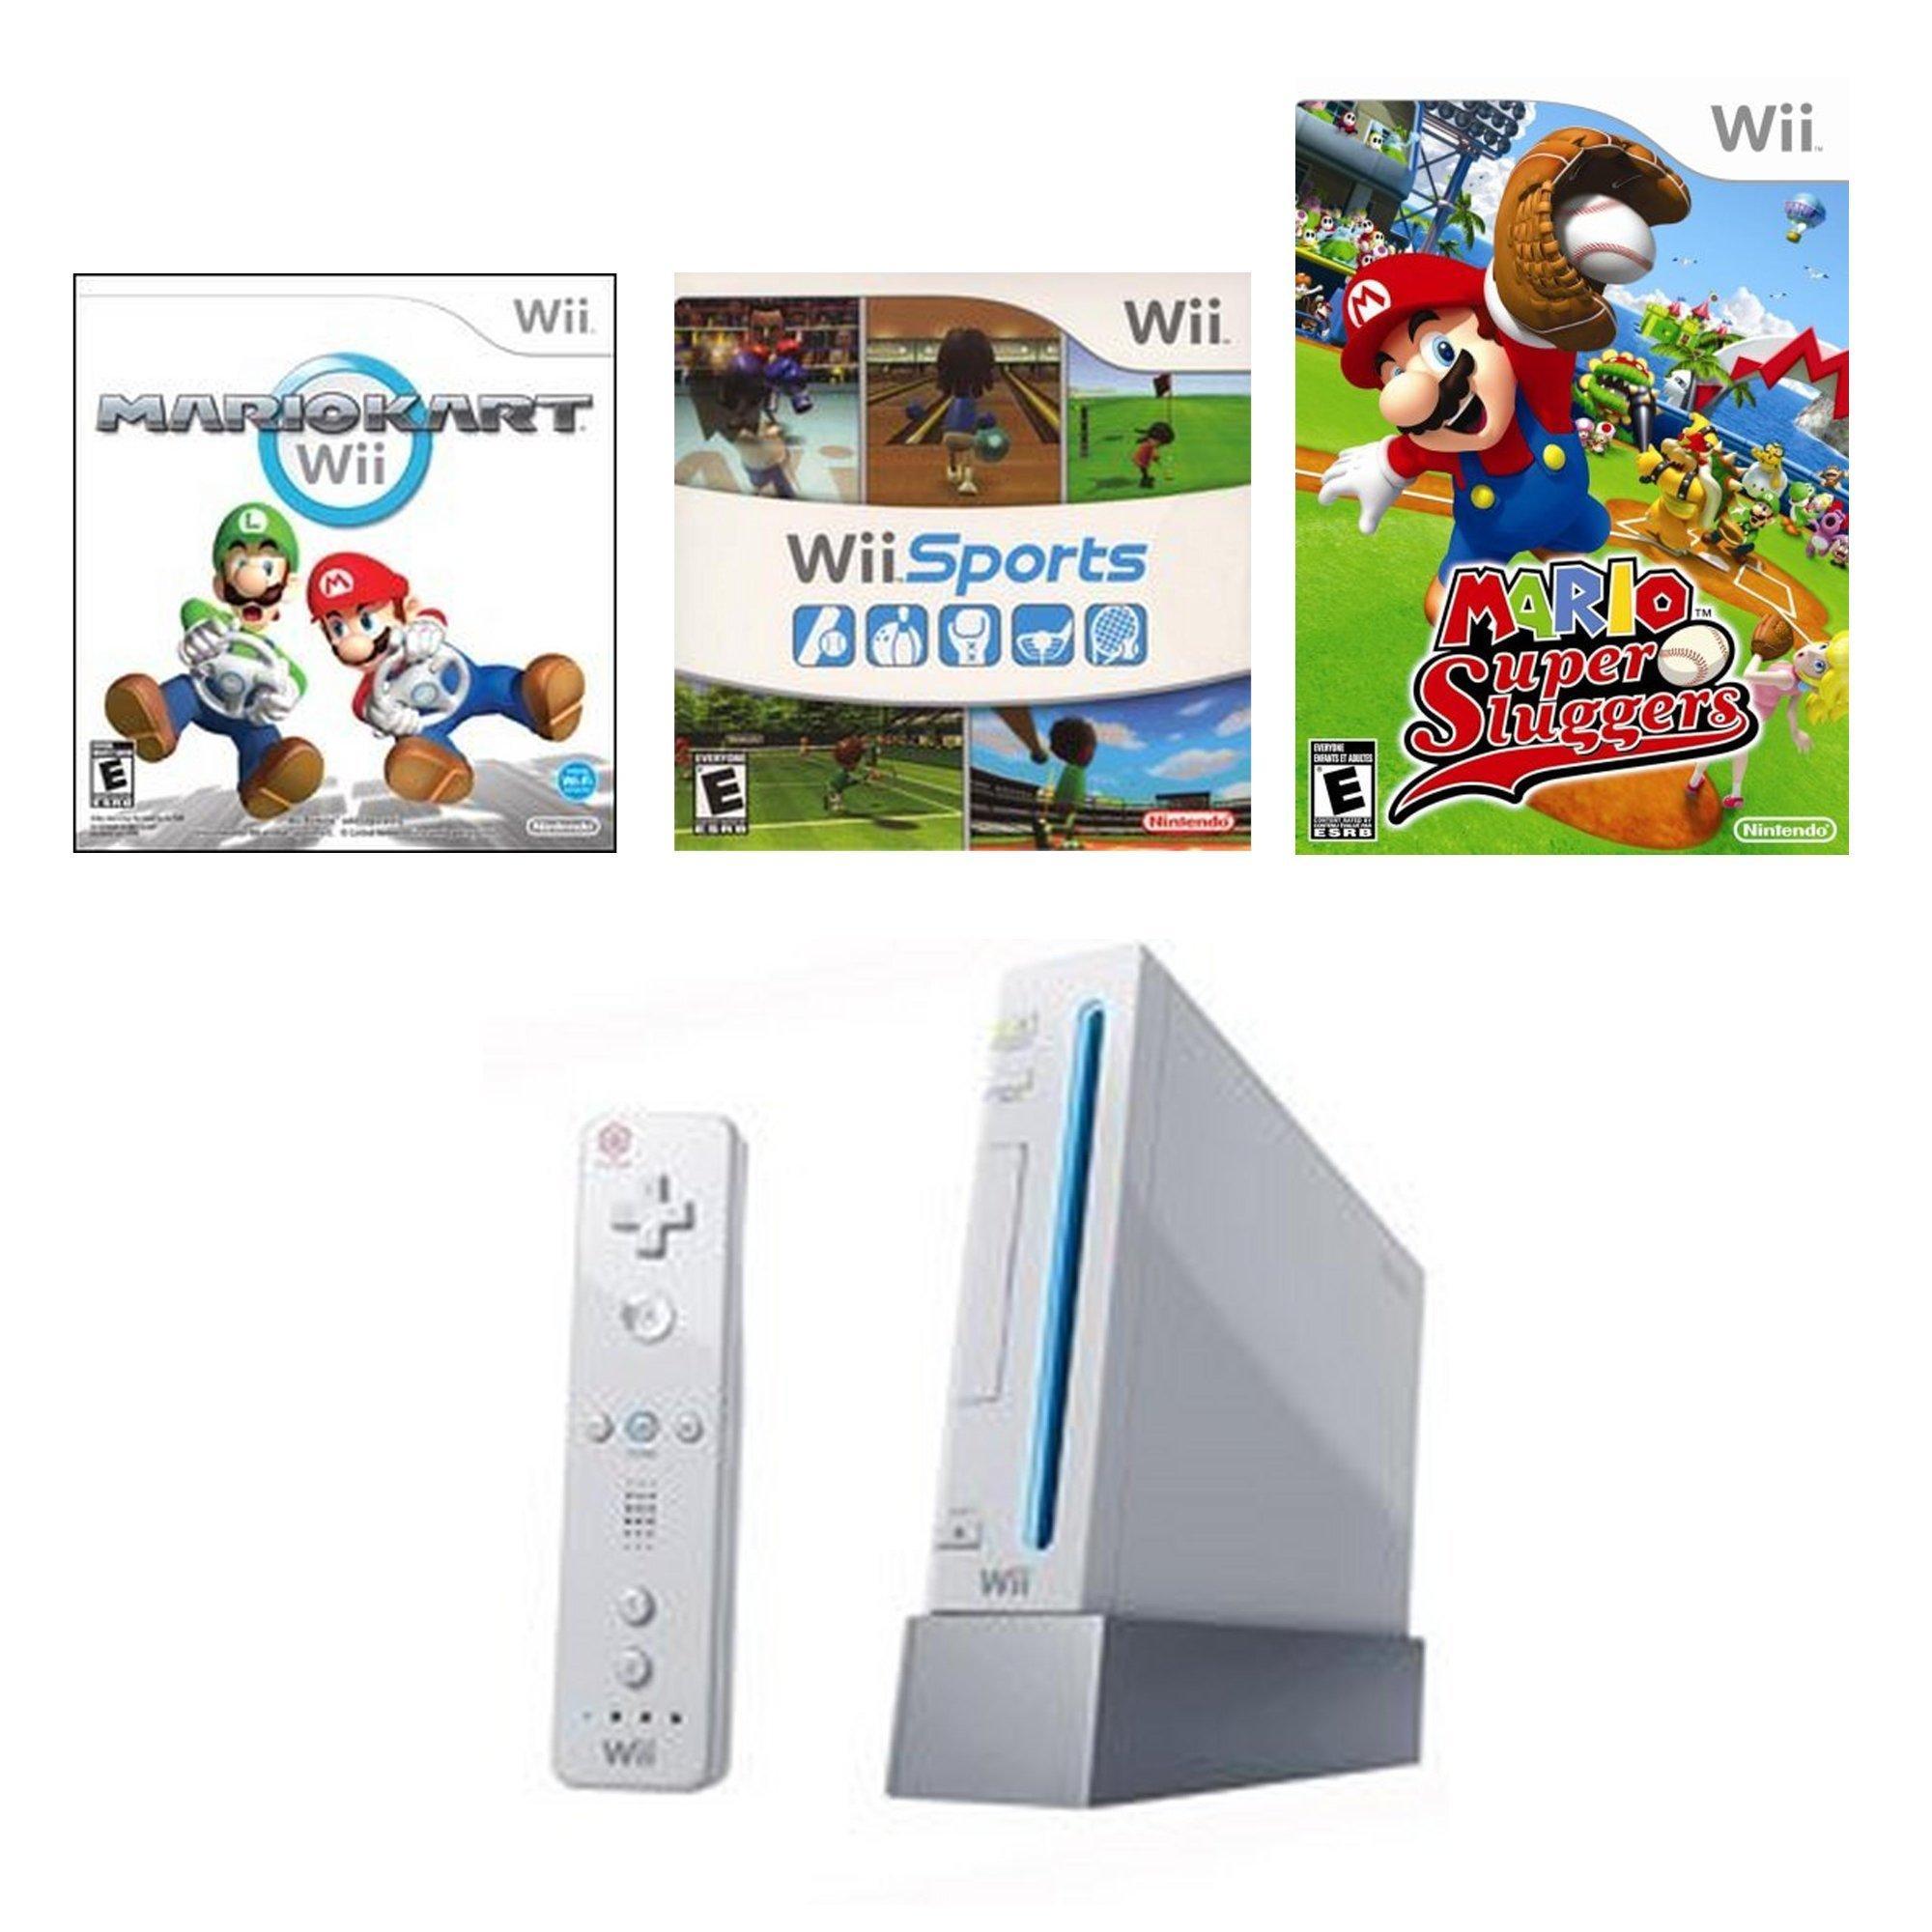 Nintendo Wii Sports Collection Blast From The Past Gamestop Premium Refurbished System Bundle Nintendo Wii Gamestop